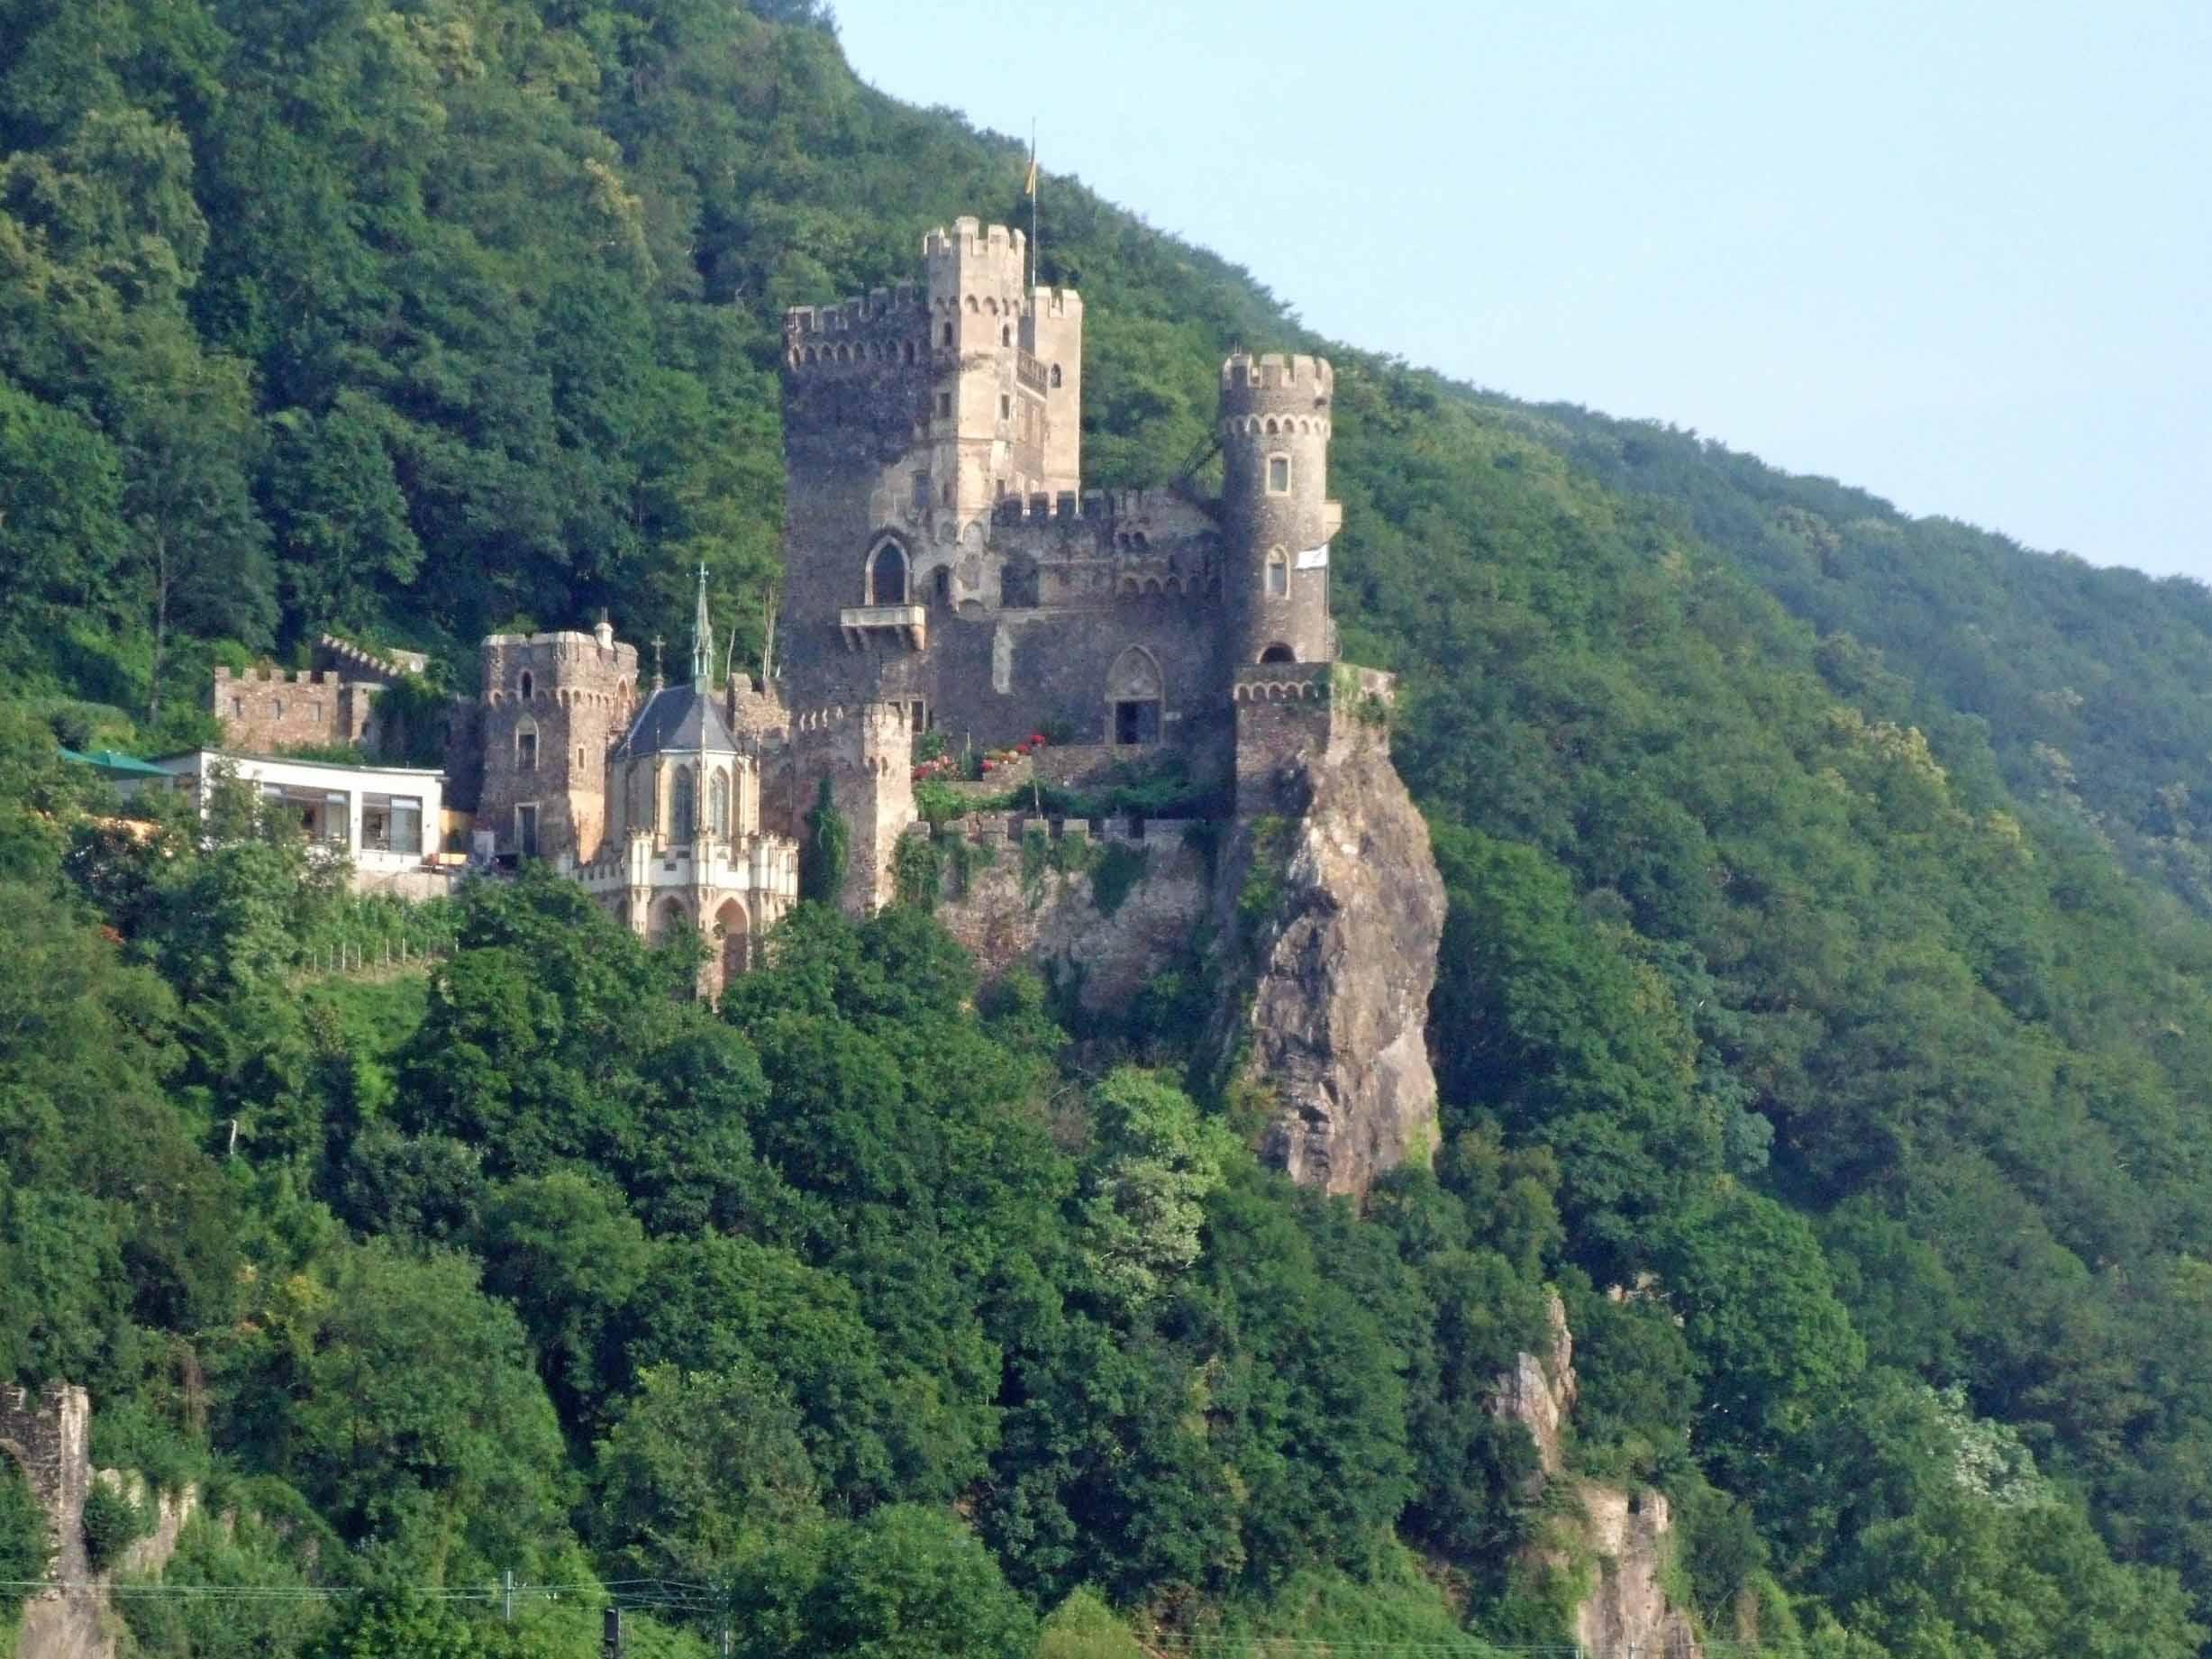 Large castle on a wooded hillside